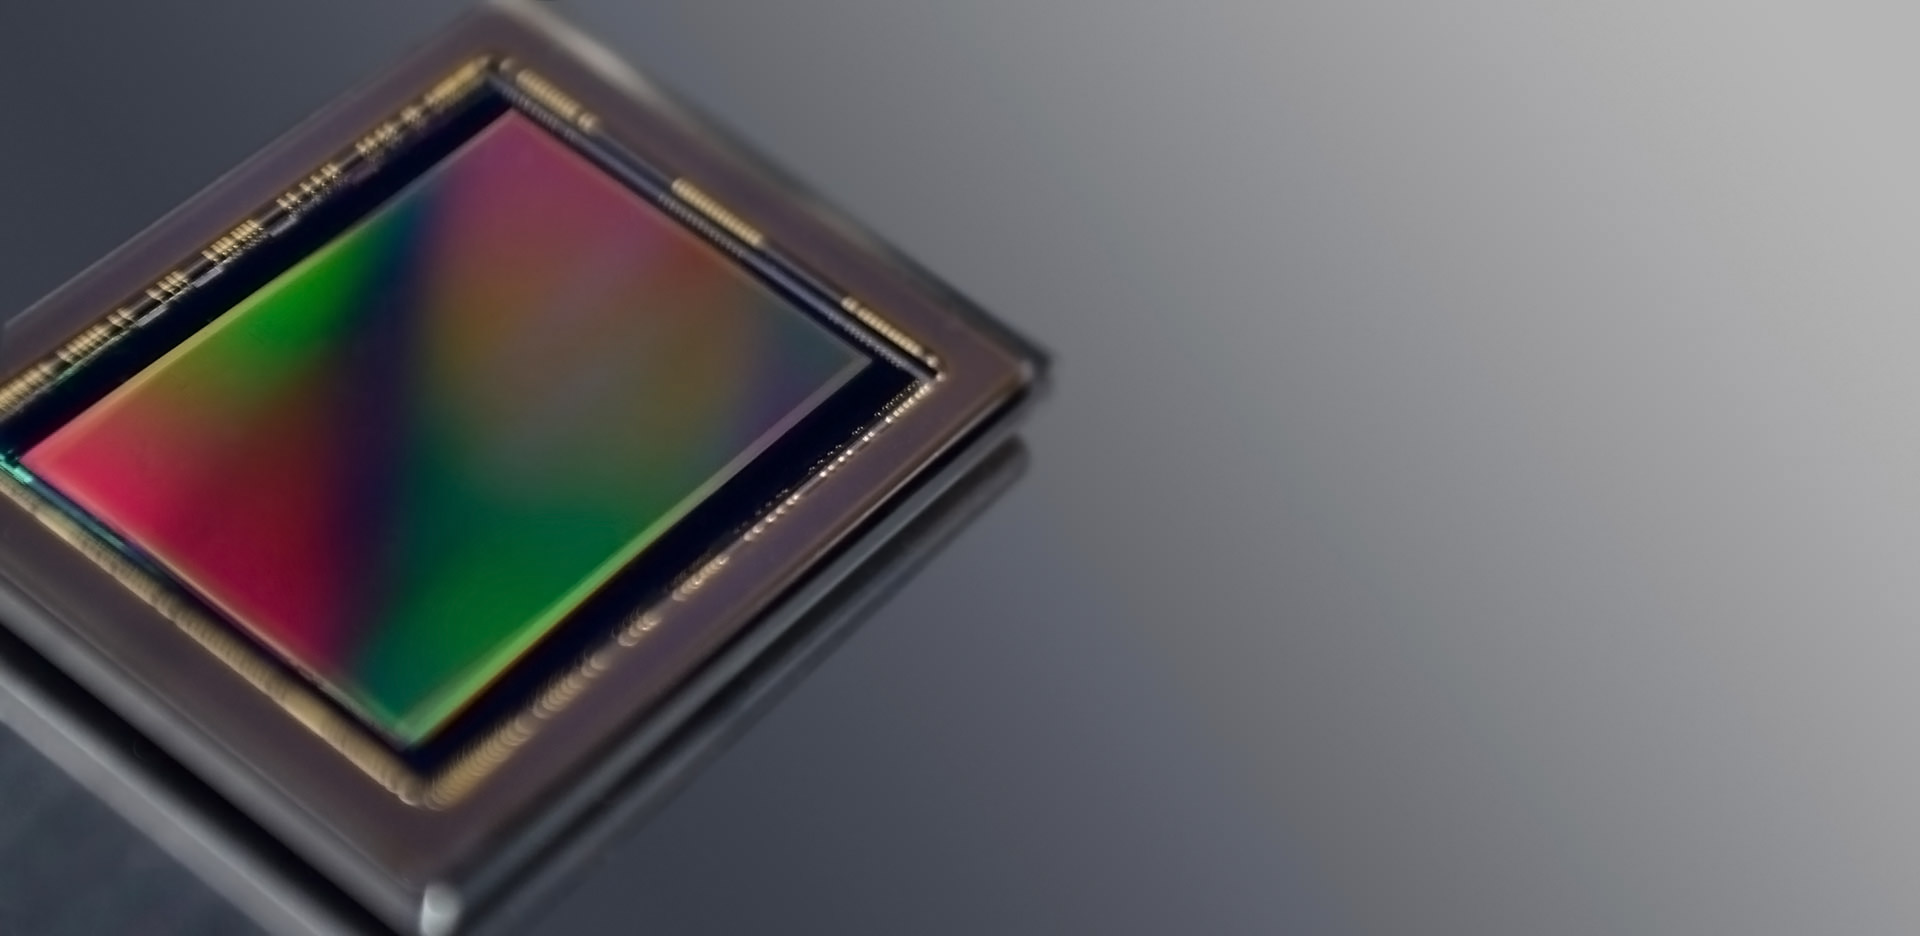 Sony Pregius CMOS